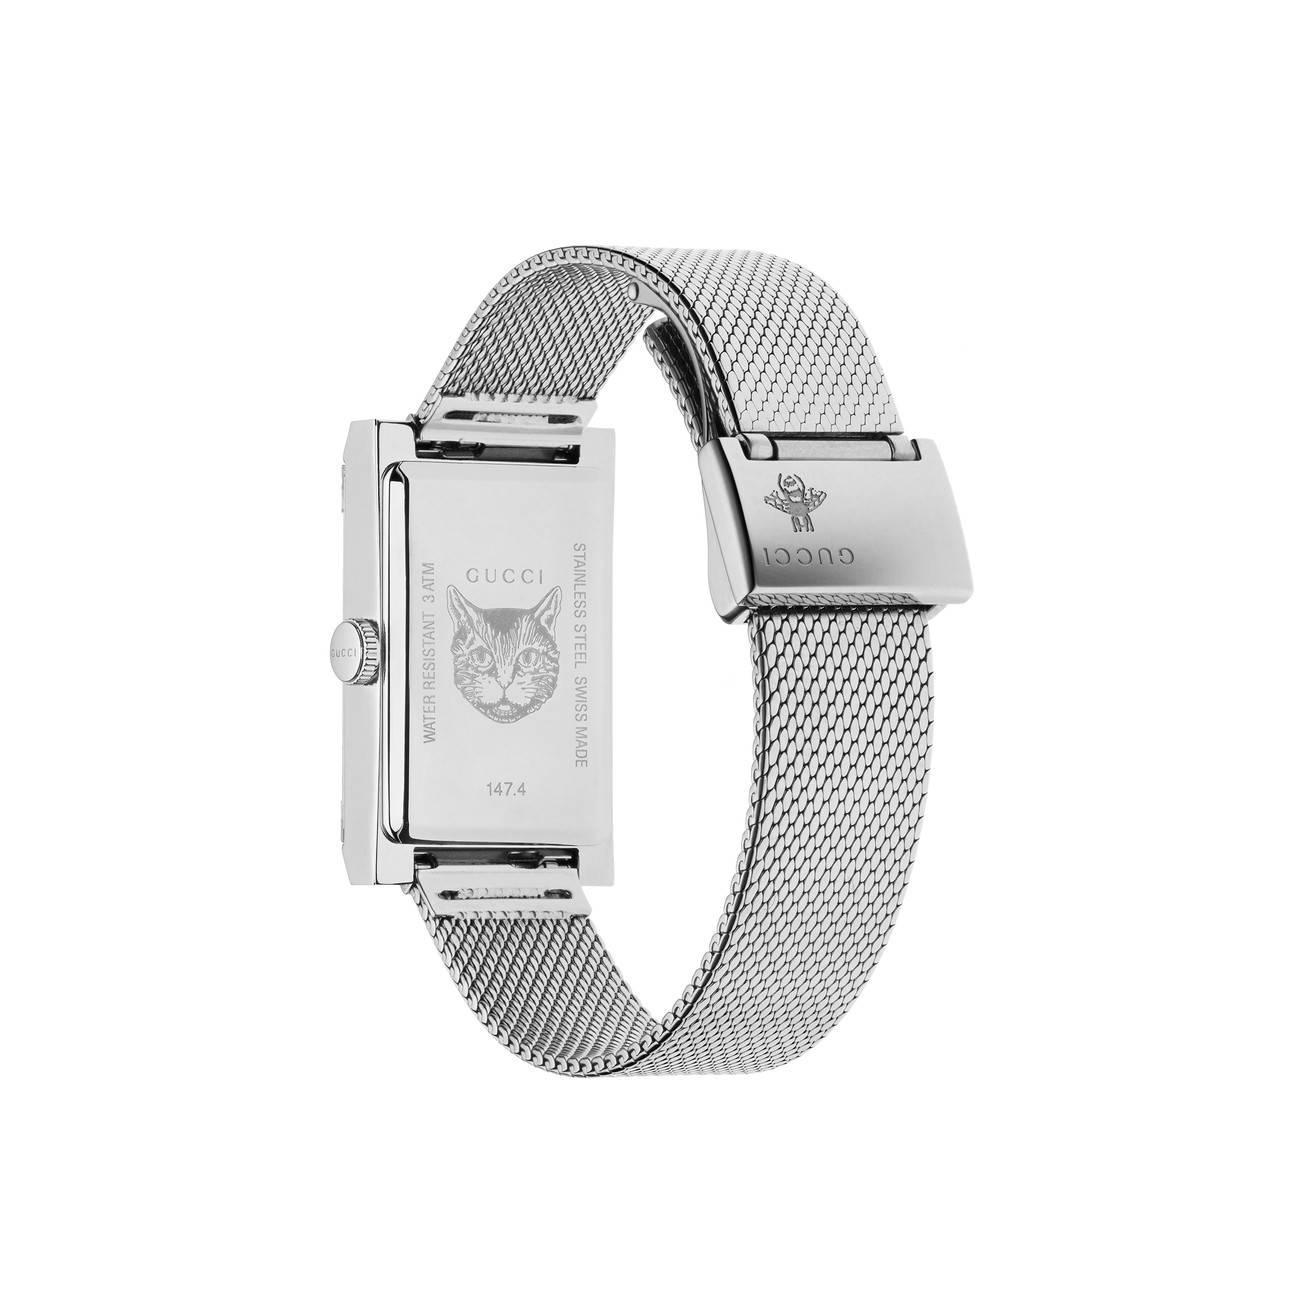 2c69412c7d8 Gucci - White G-frame Watch